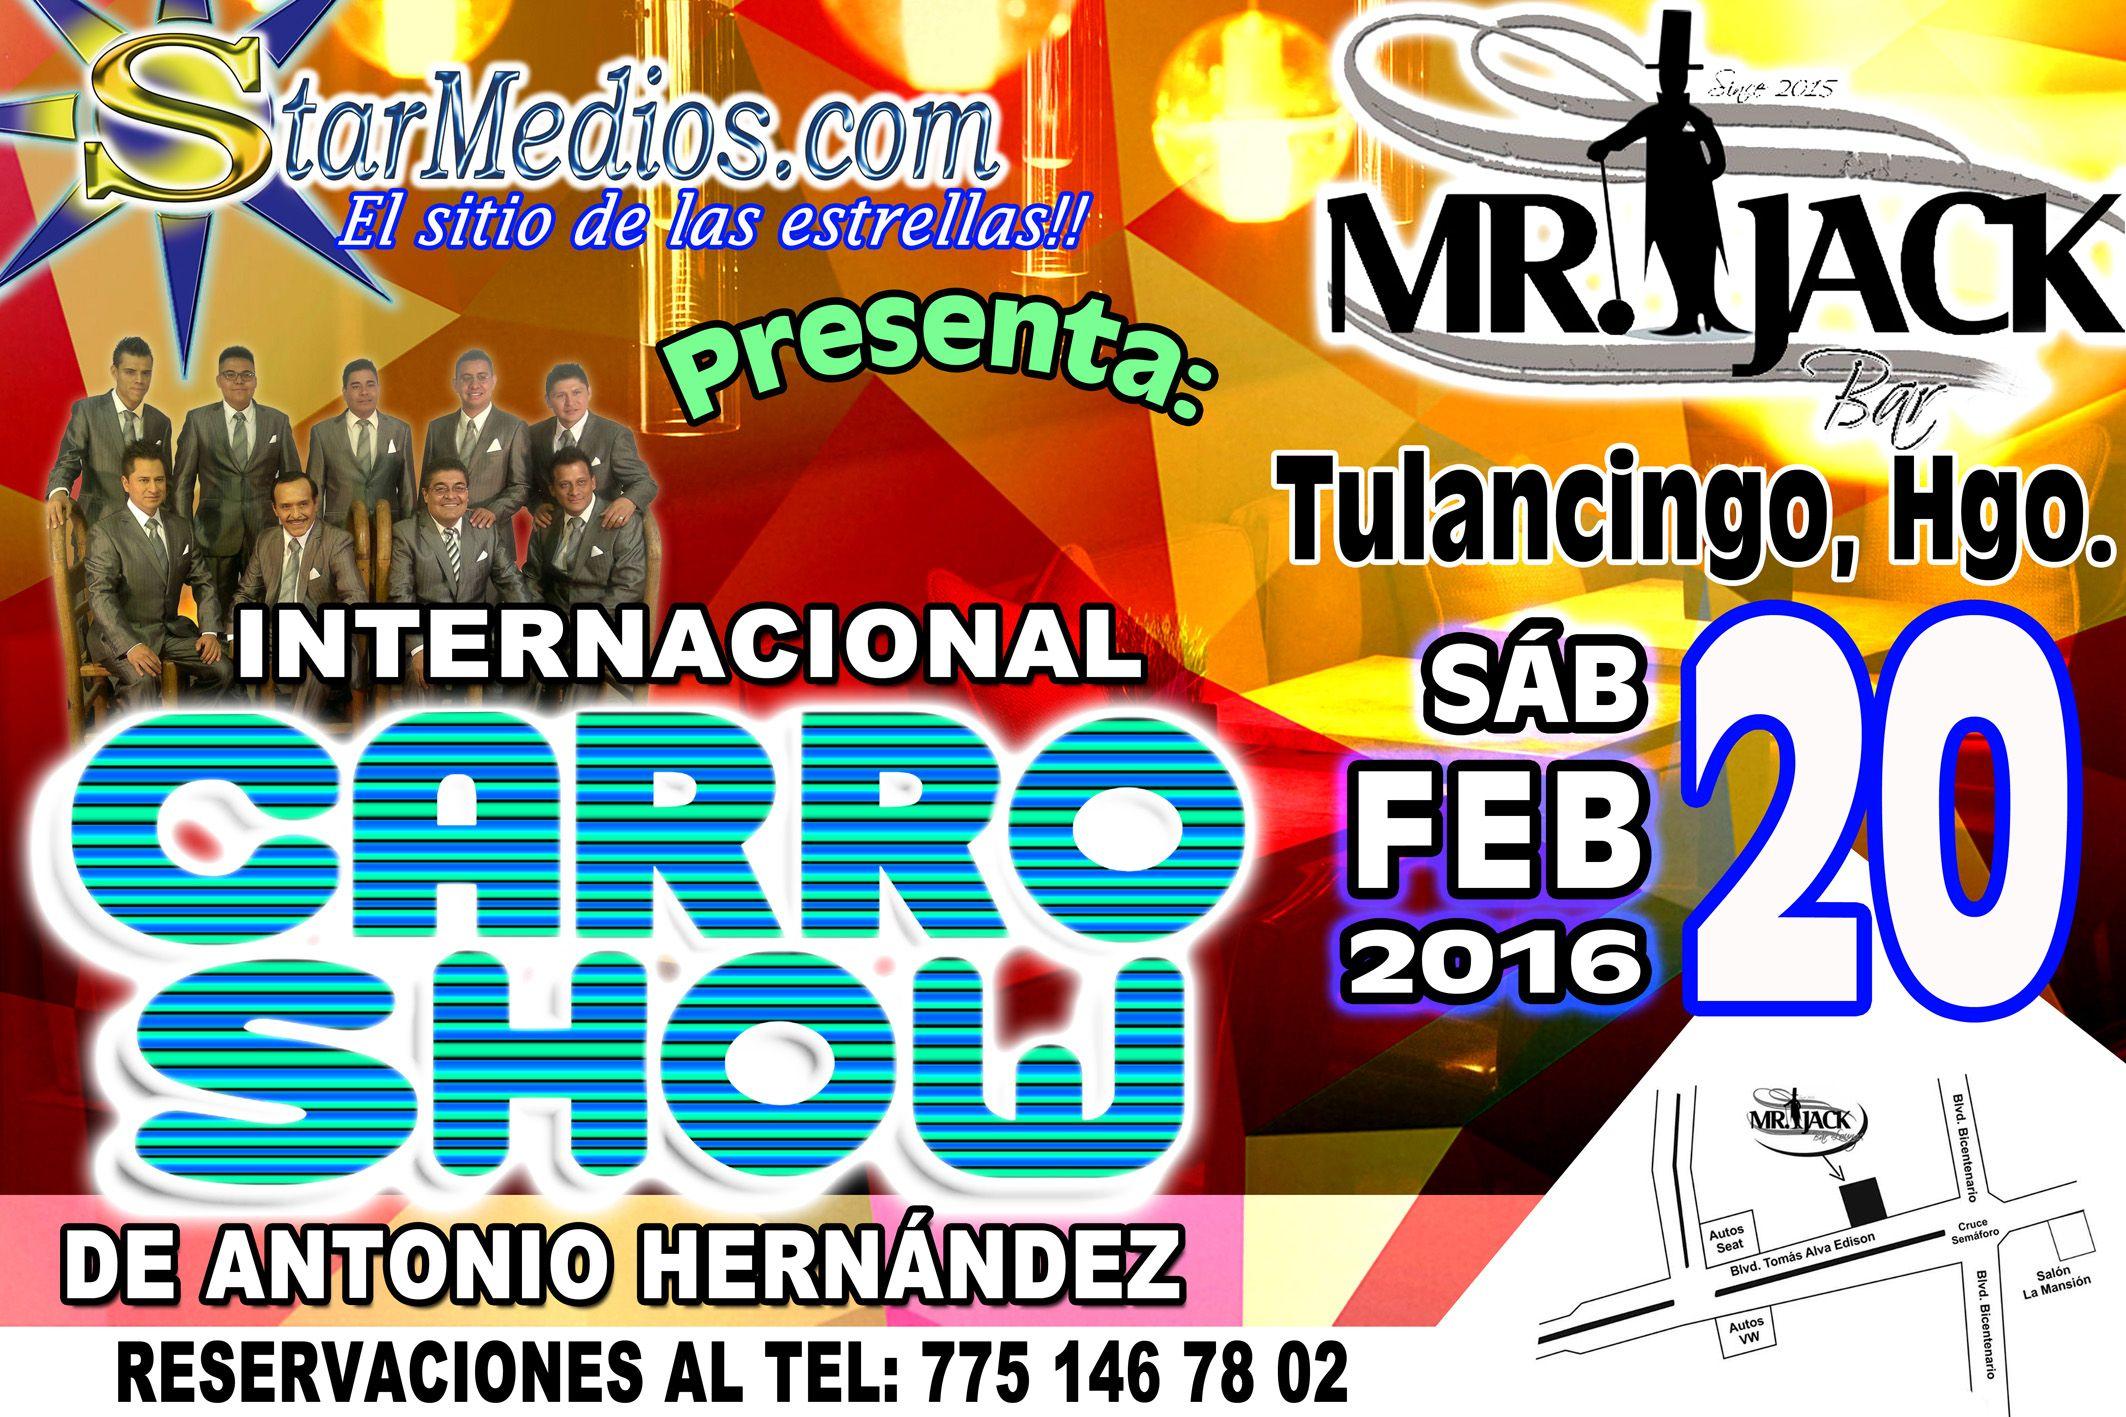 Internacional Carro Show de Antonio Hdez